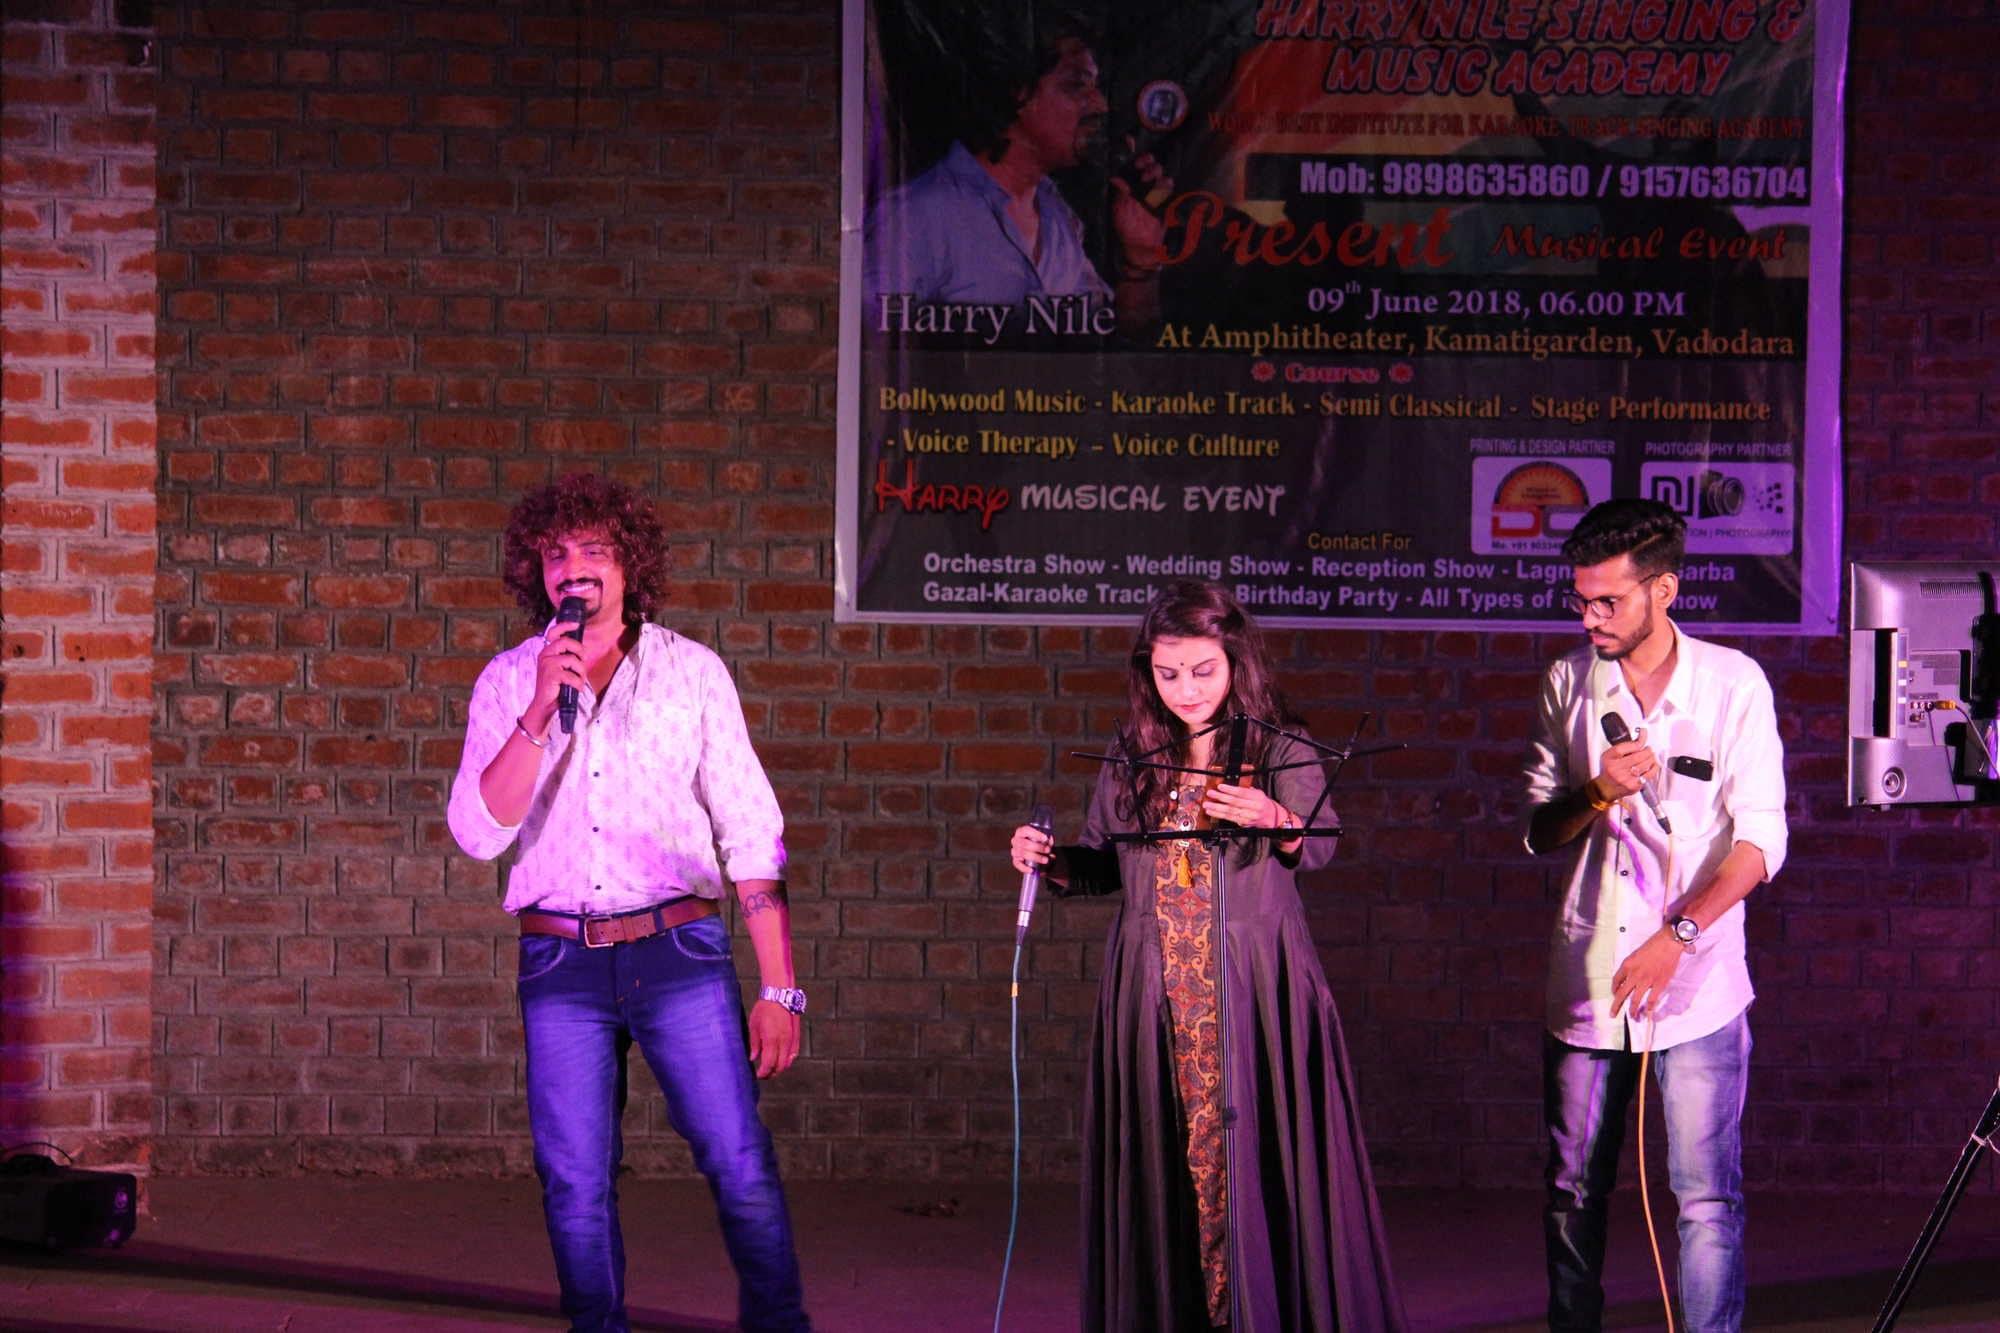 Top Music Classes For Hindi Song in Vadodara - Justdial